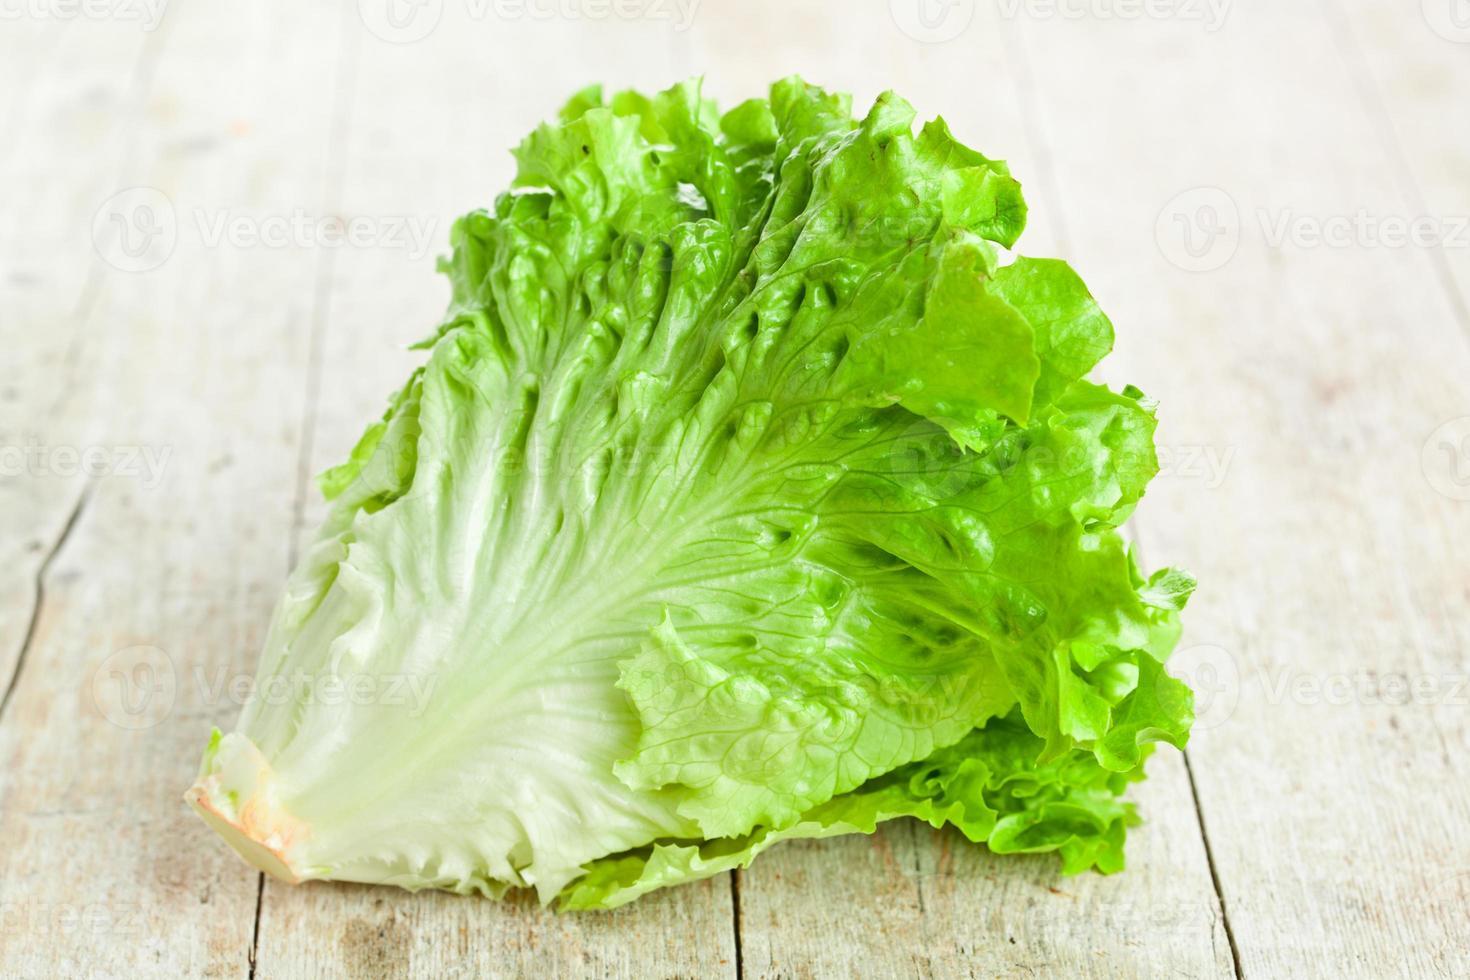 salade verte fraîche photo